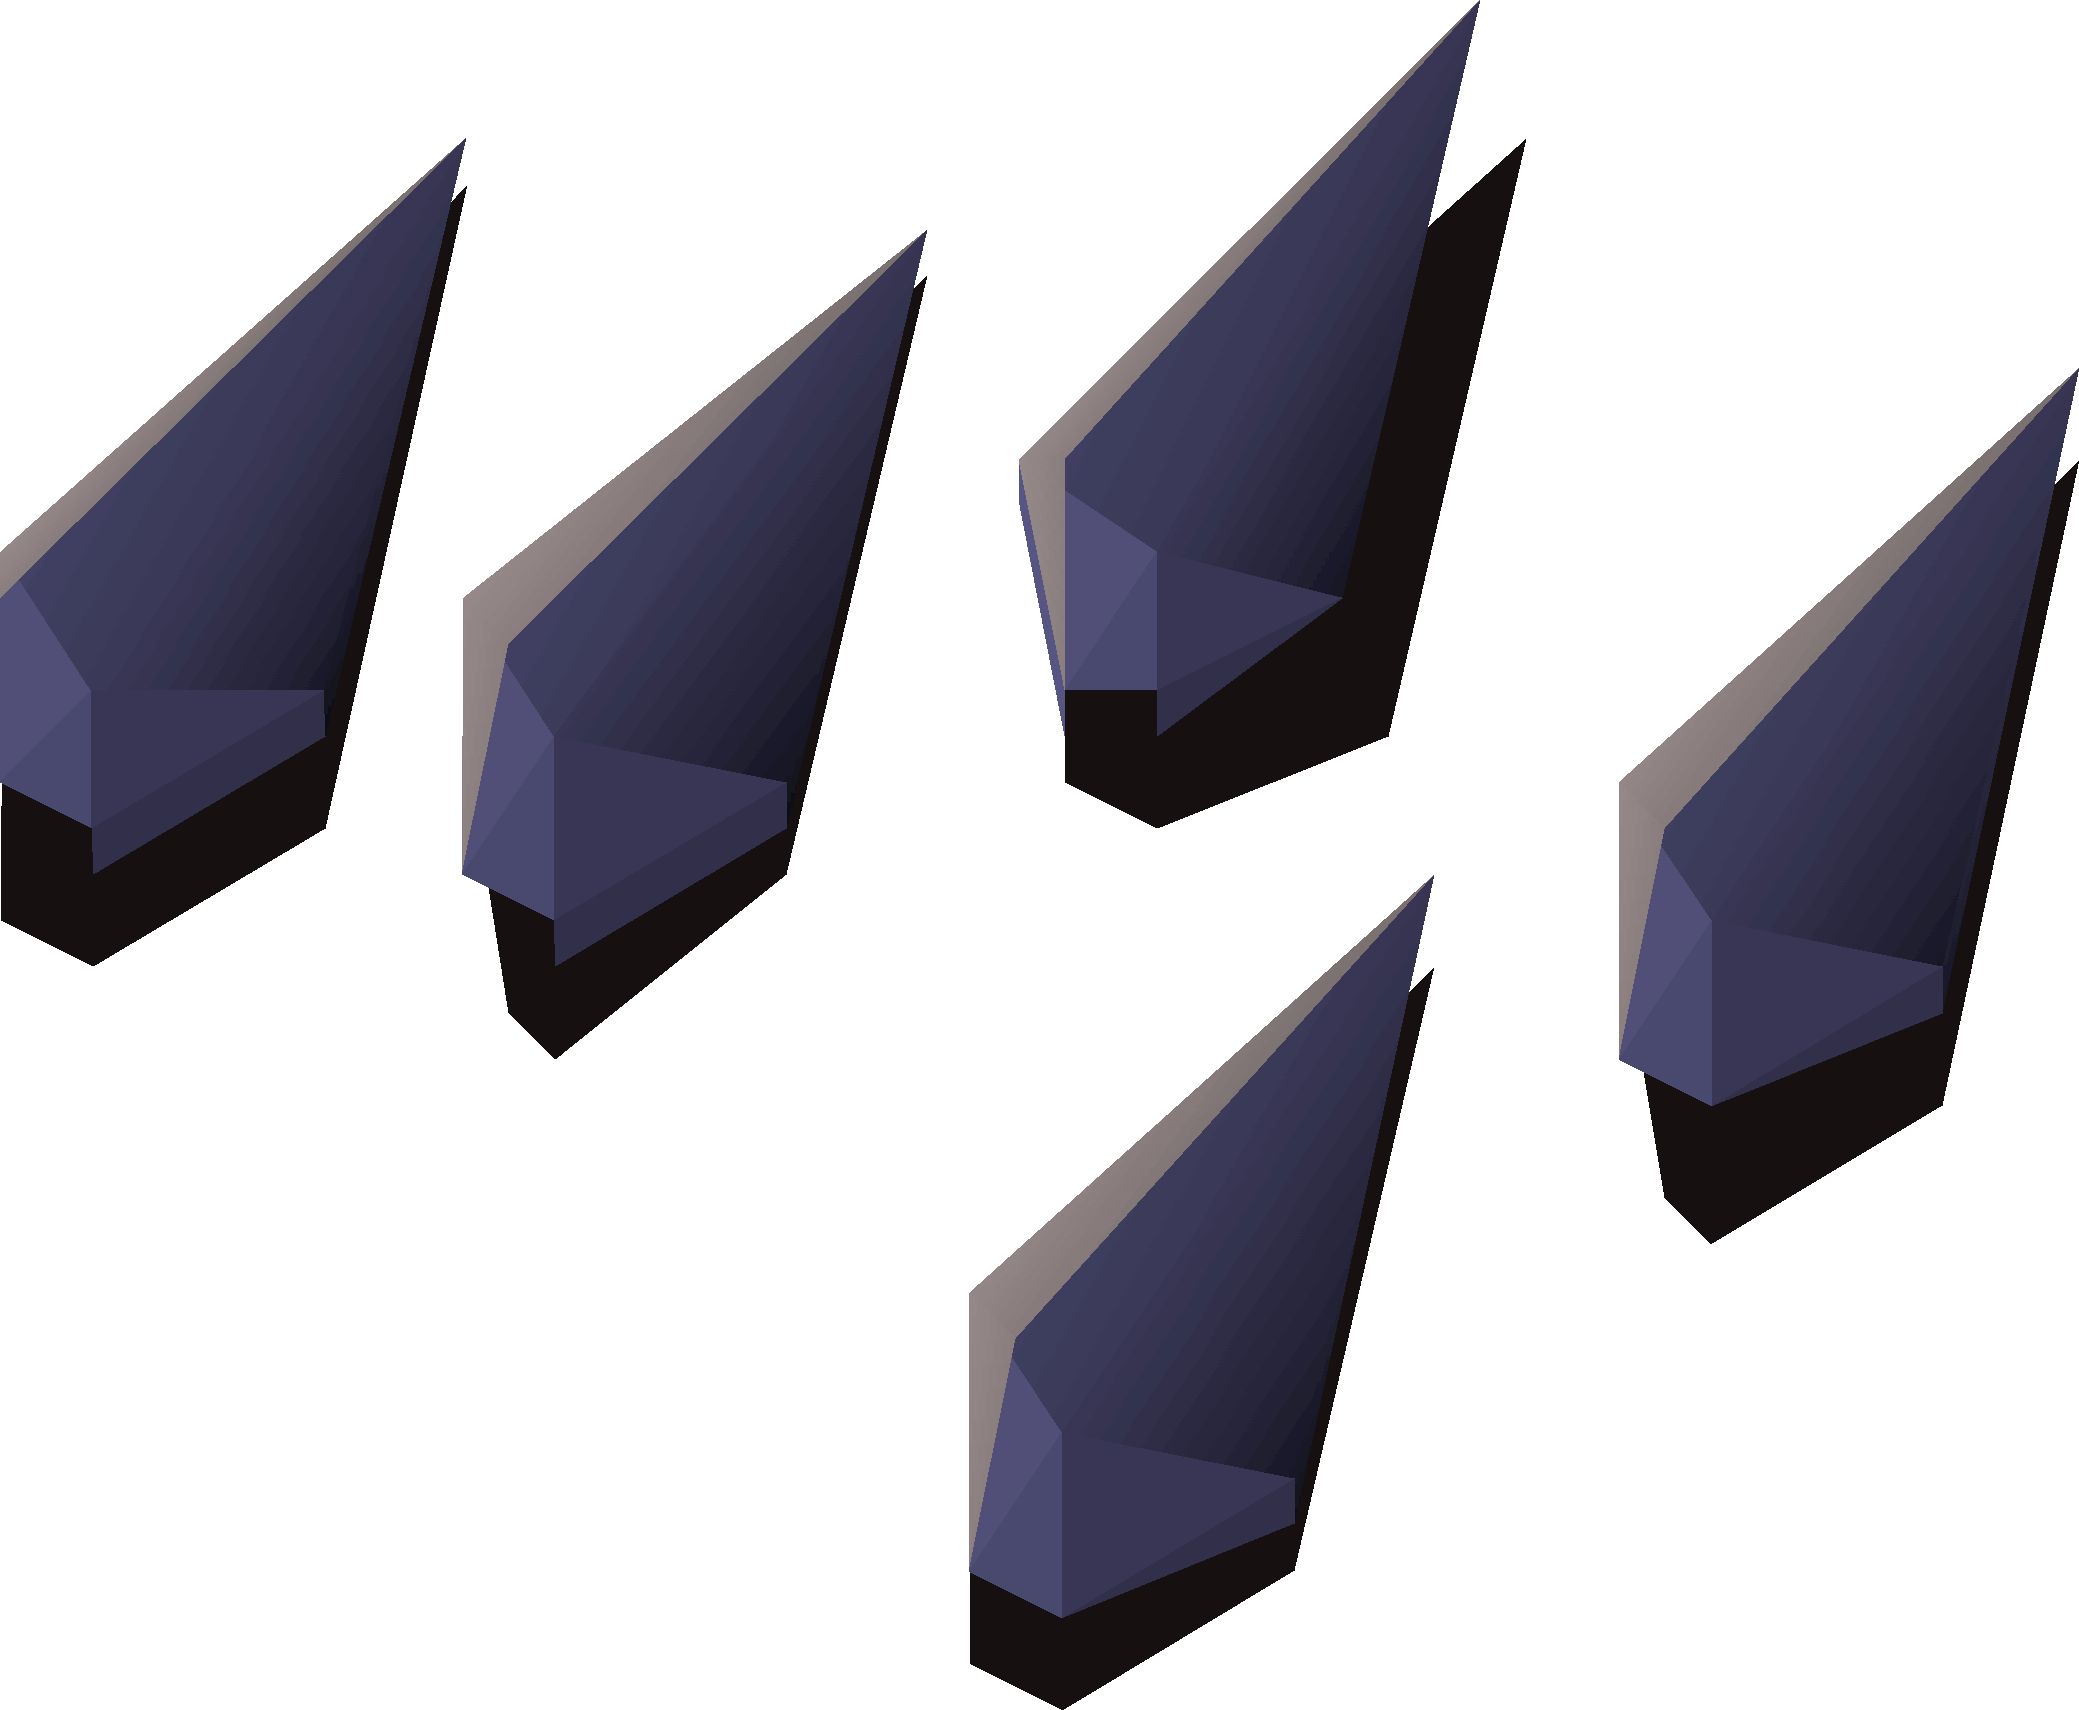 Mithril arrowtips